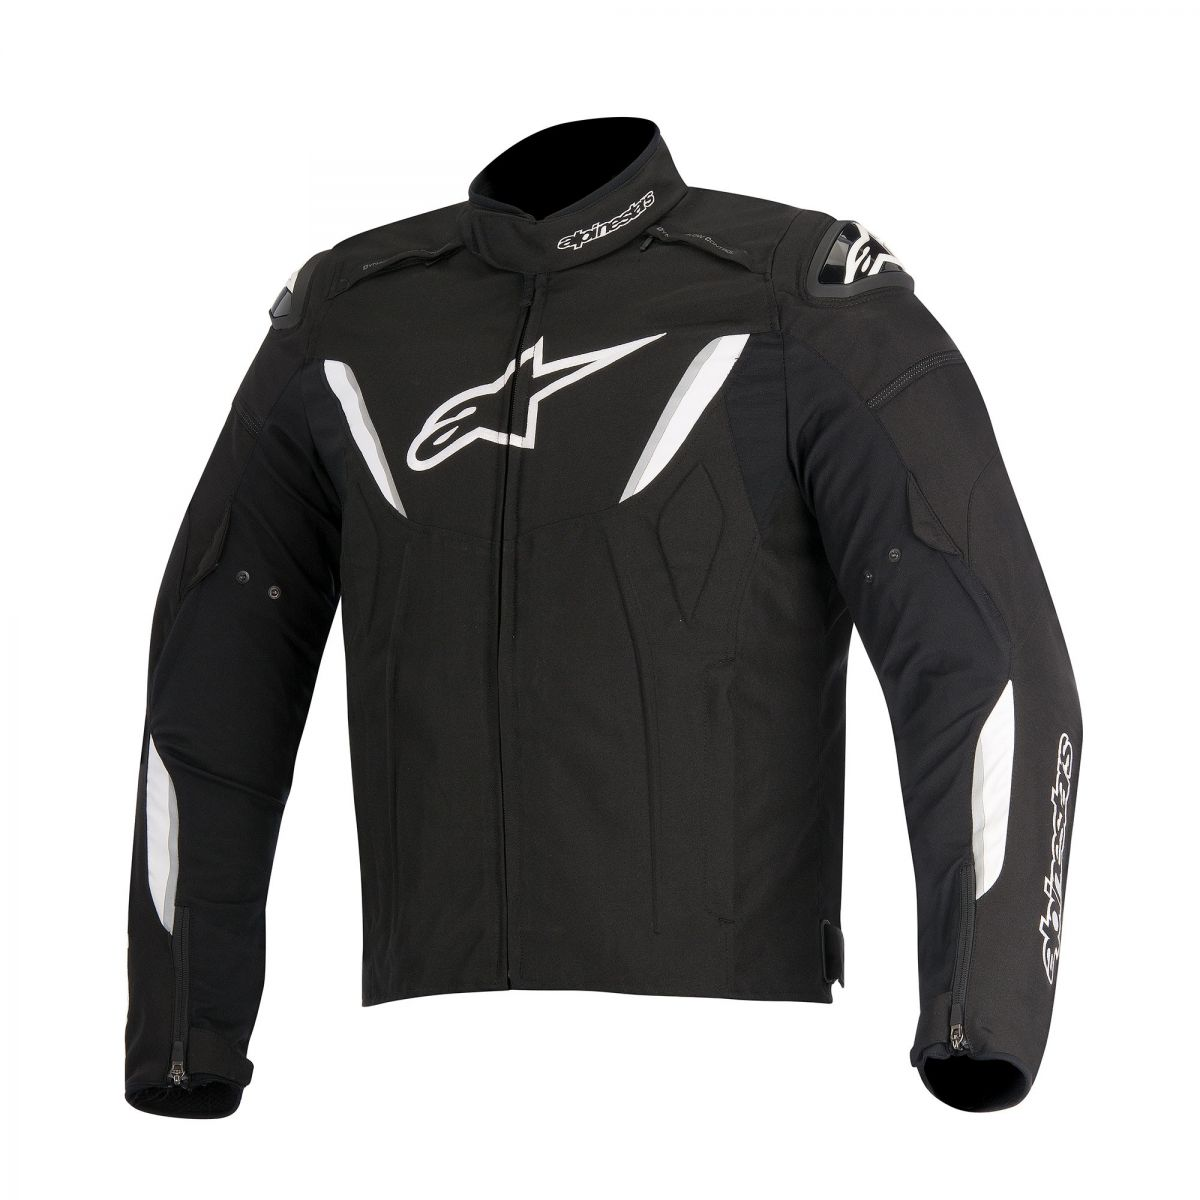 Jaqueta Alpinestars T GP R WP Impermeável Black  - Super Bike - Loja Oficial Alpinestars